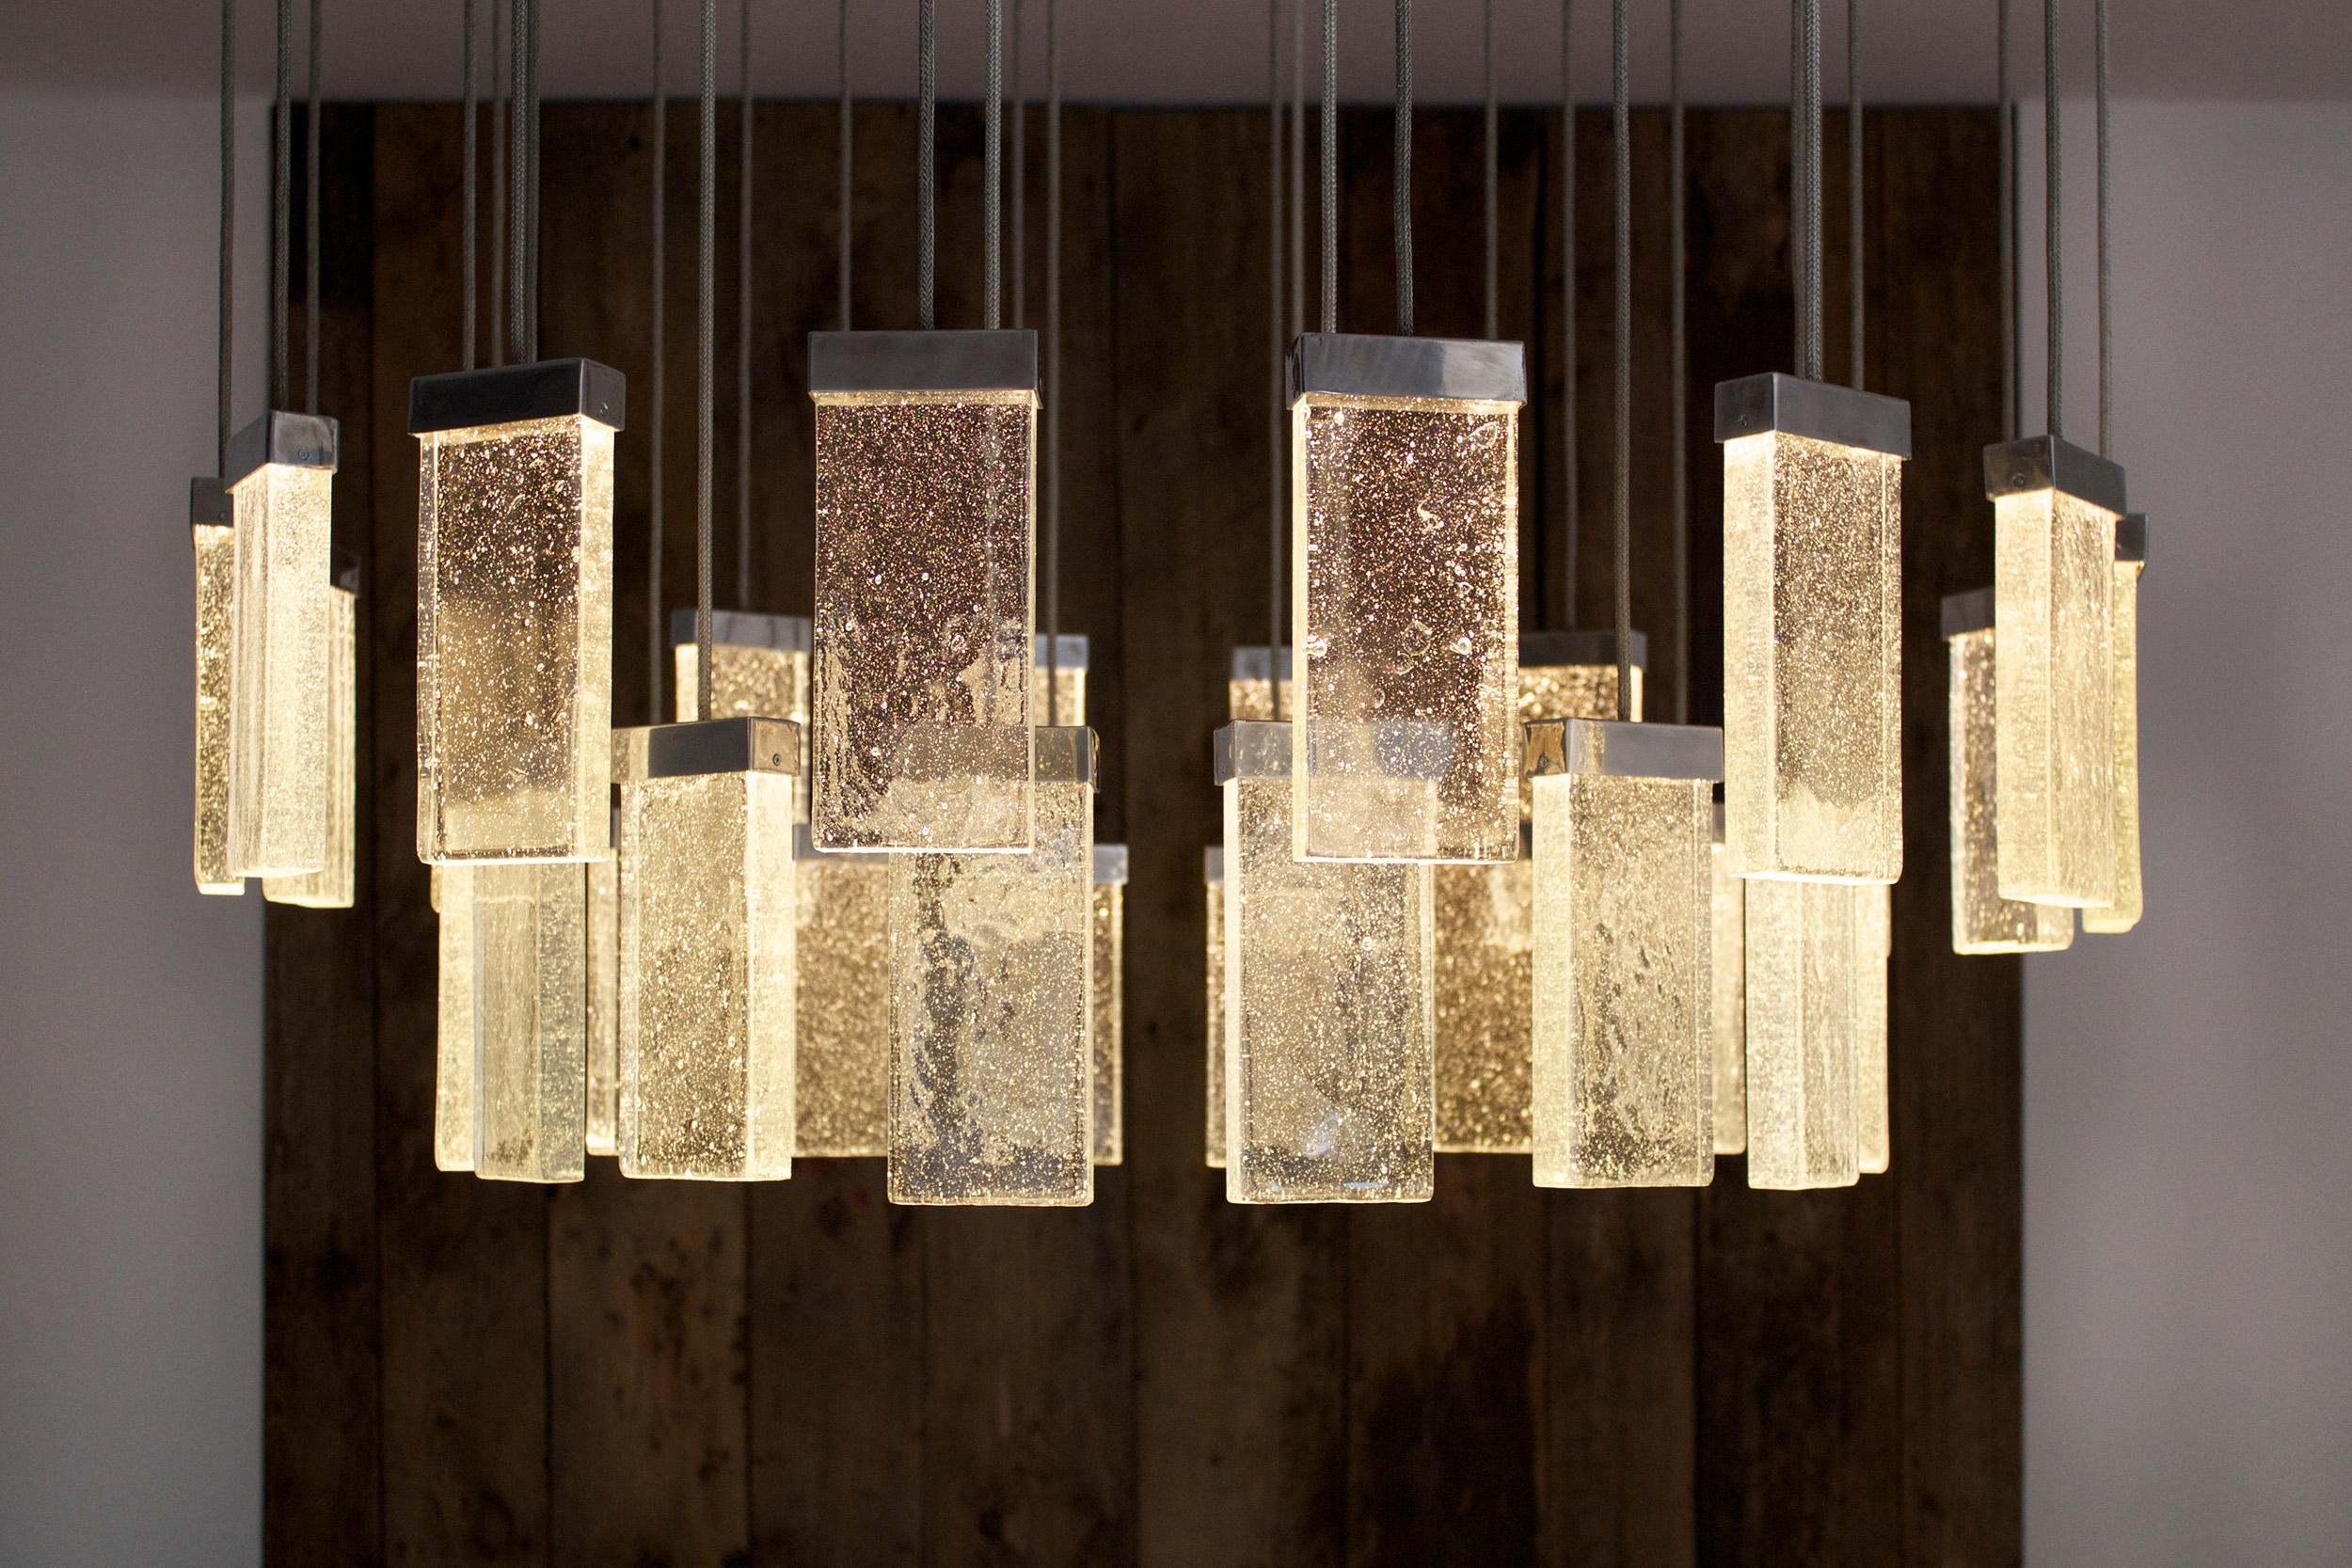 ... GRAND CRU Chandelier U2013 Ceiling Light By MASSIFCENTRAL | Chandeliers ...